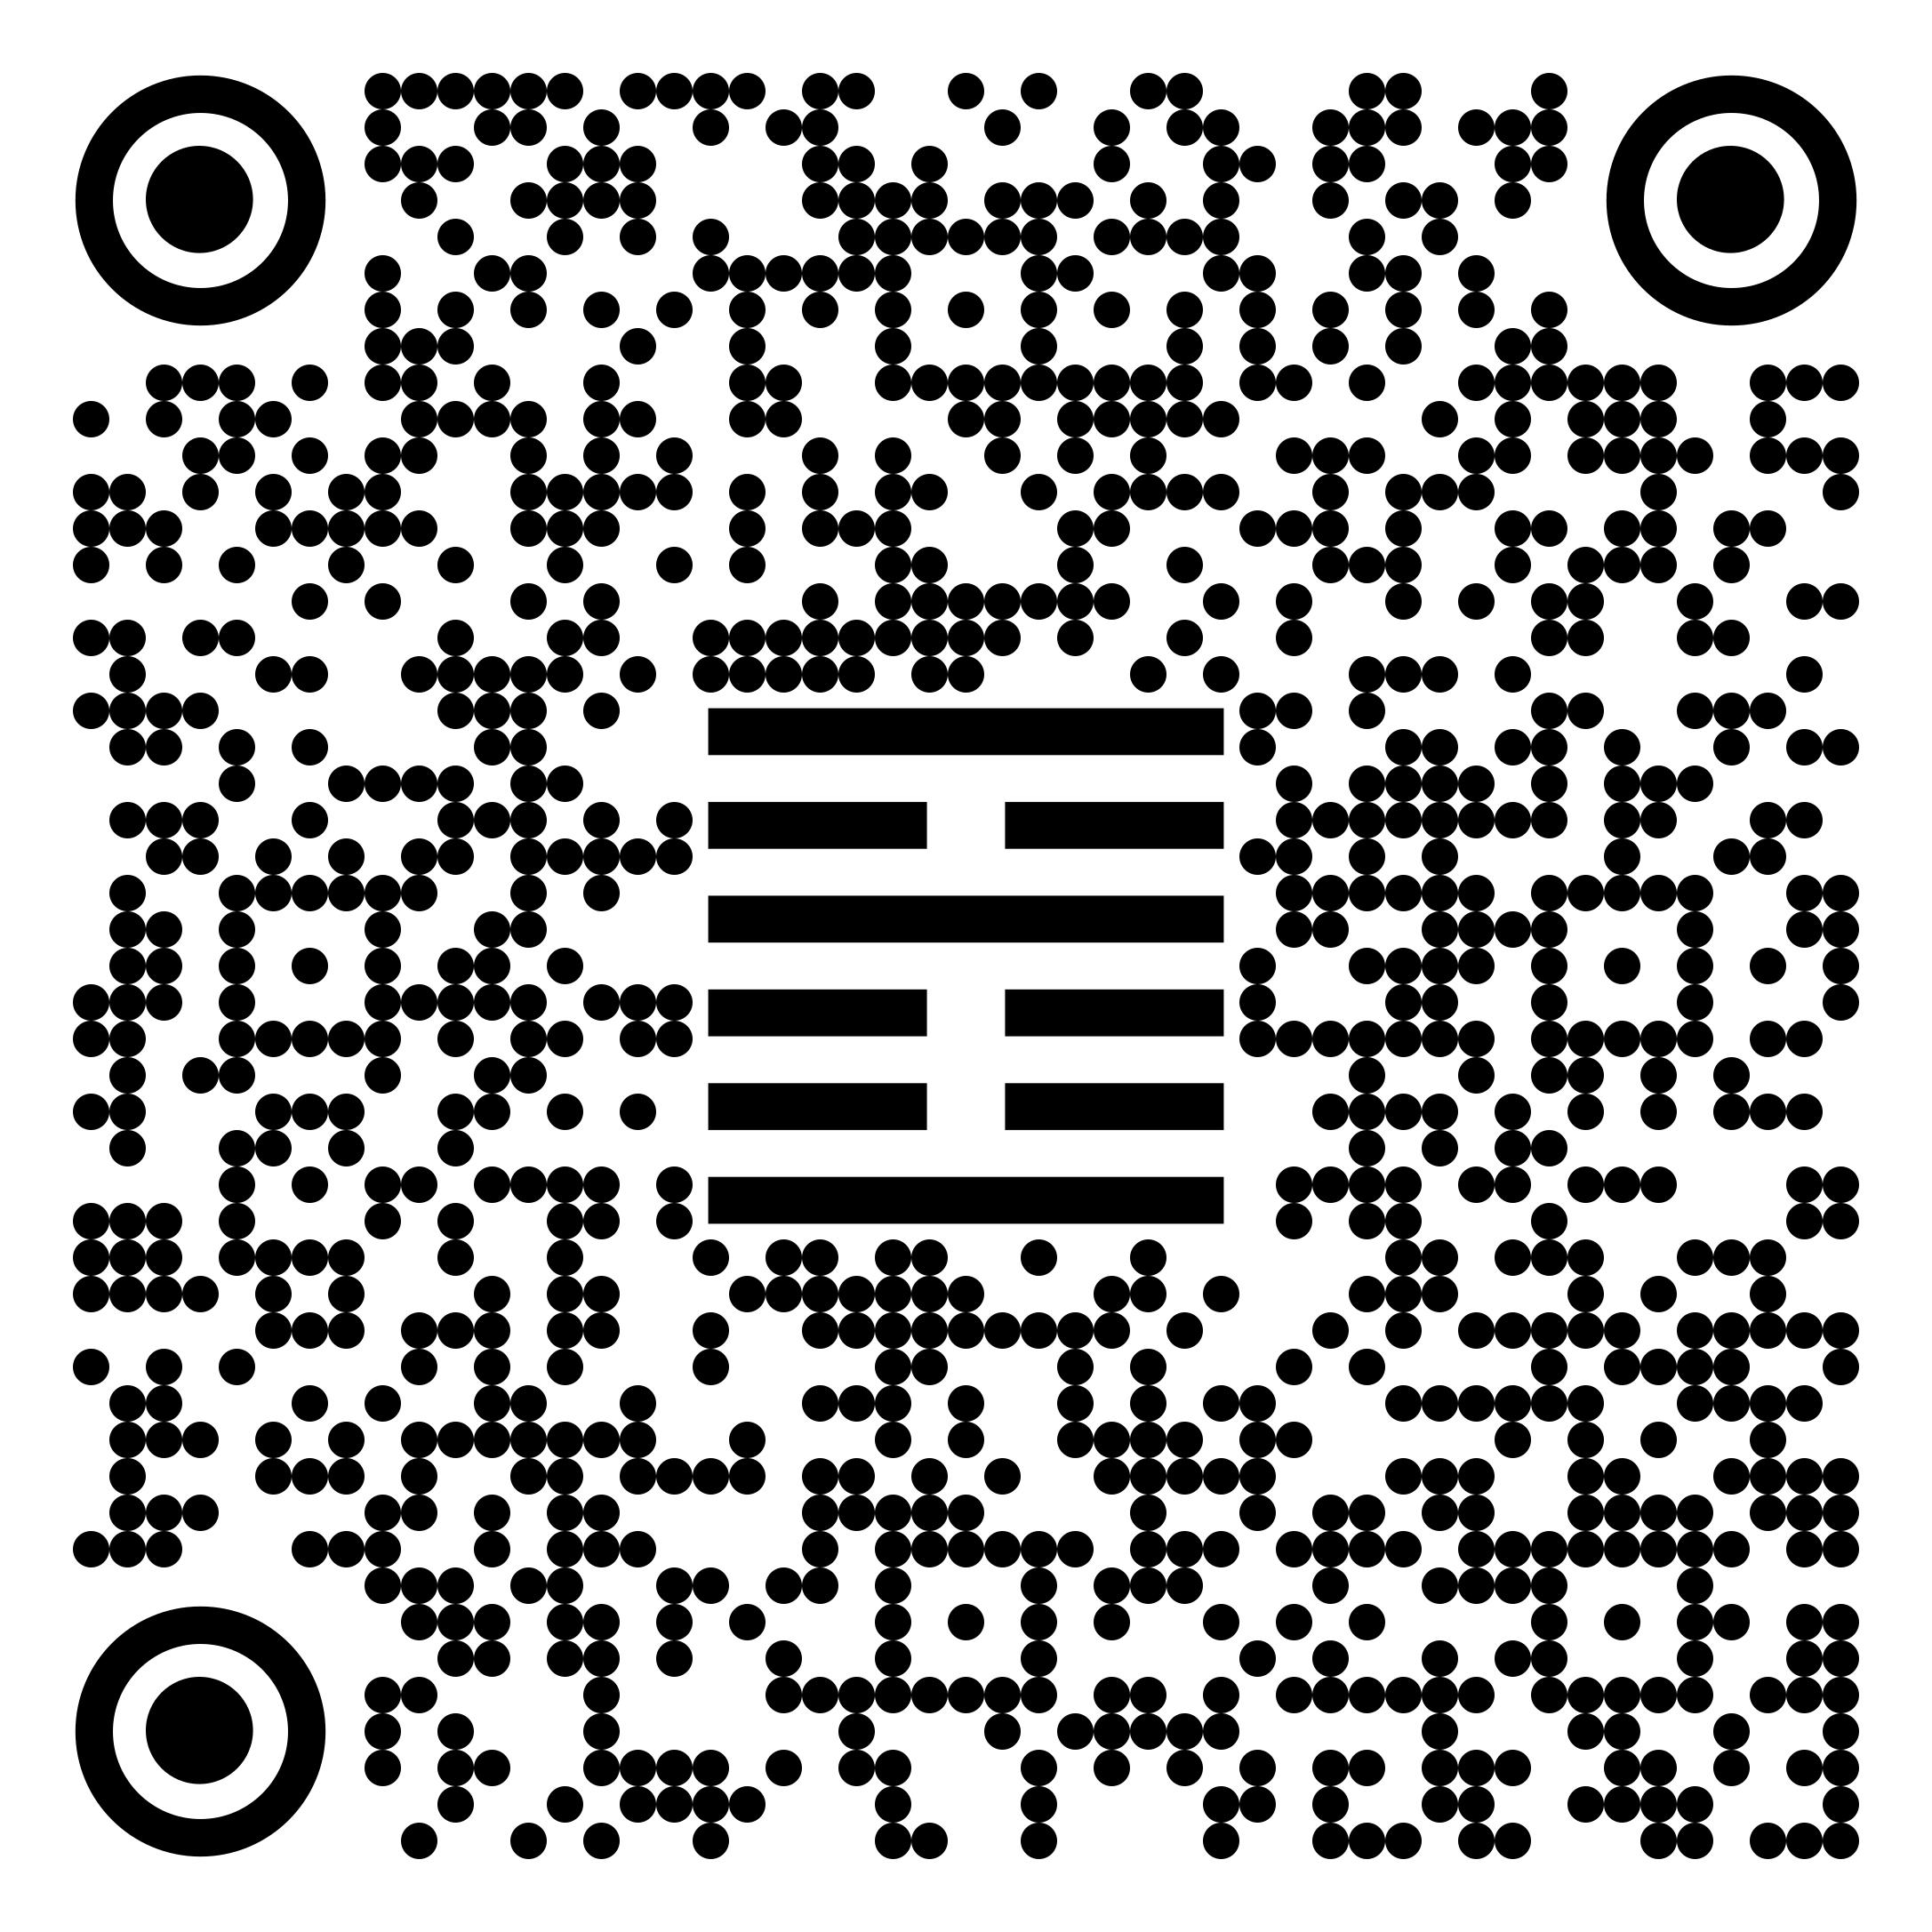 qr-code-21.png